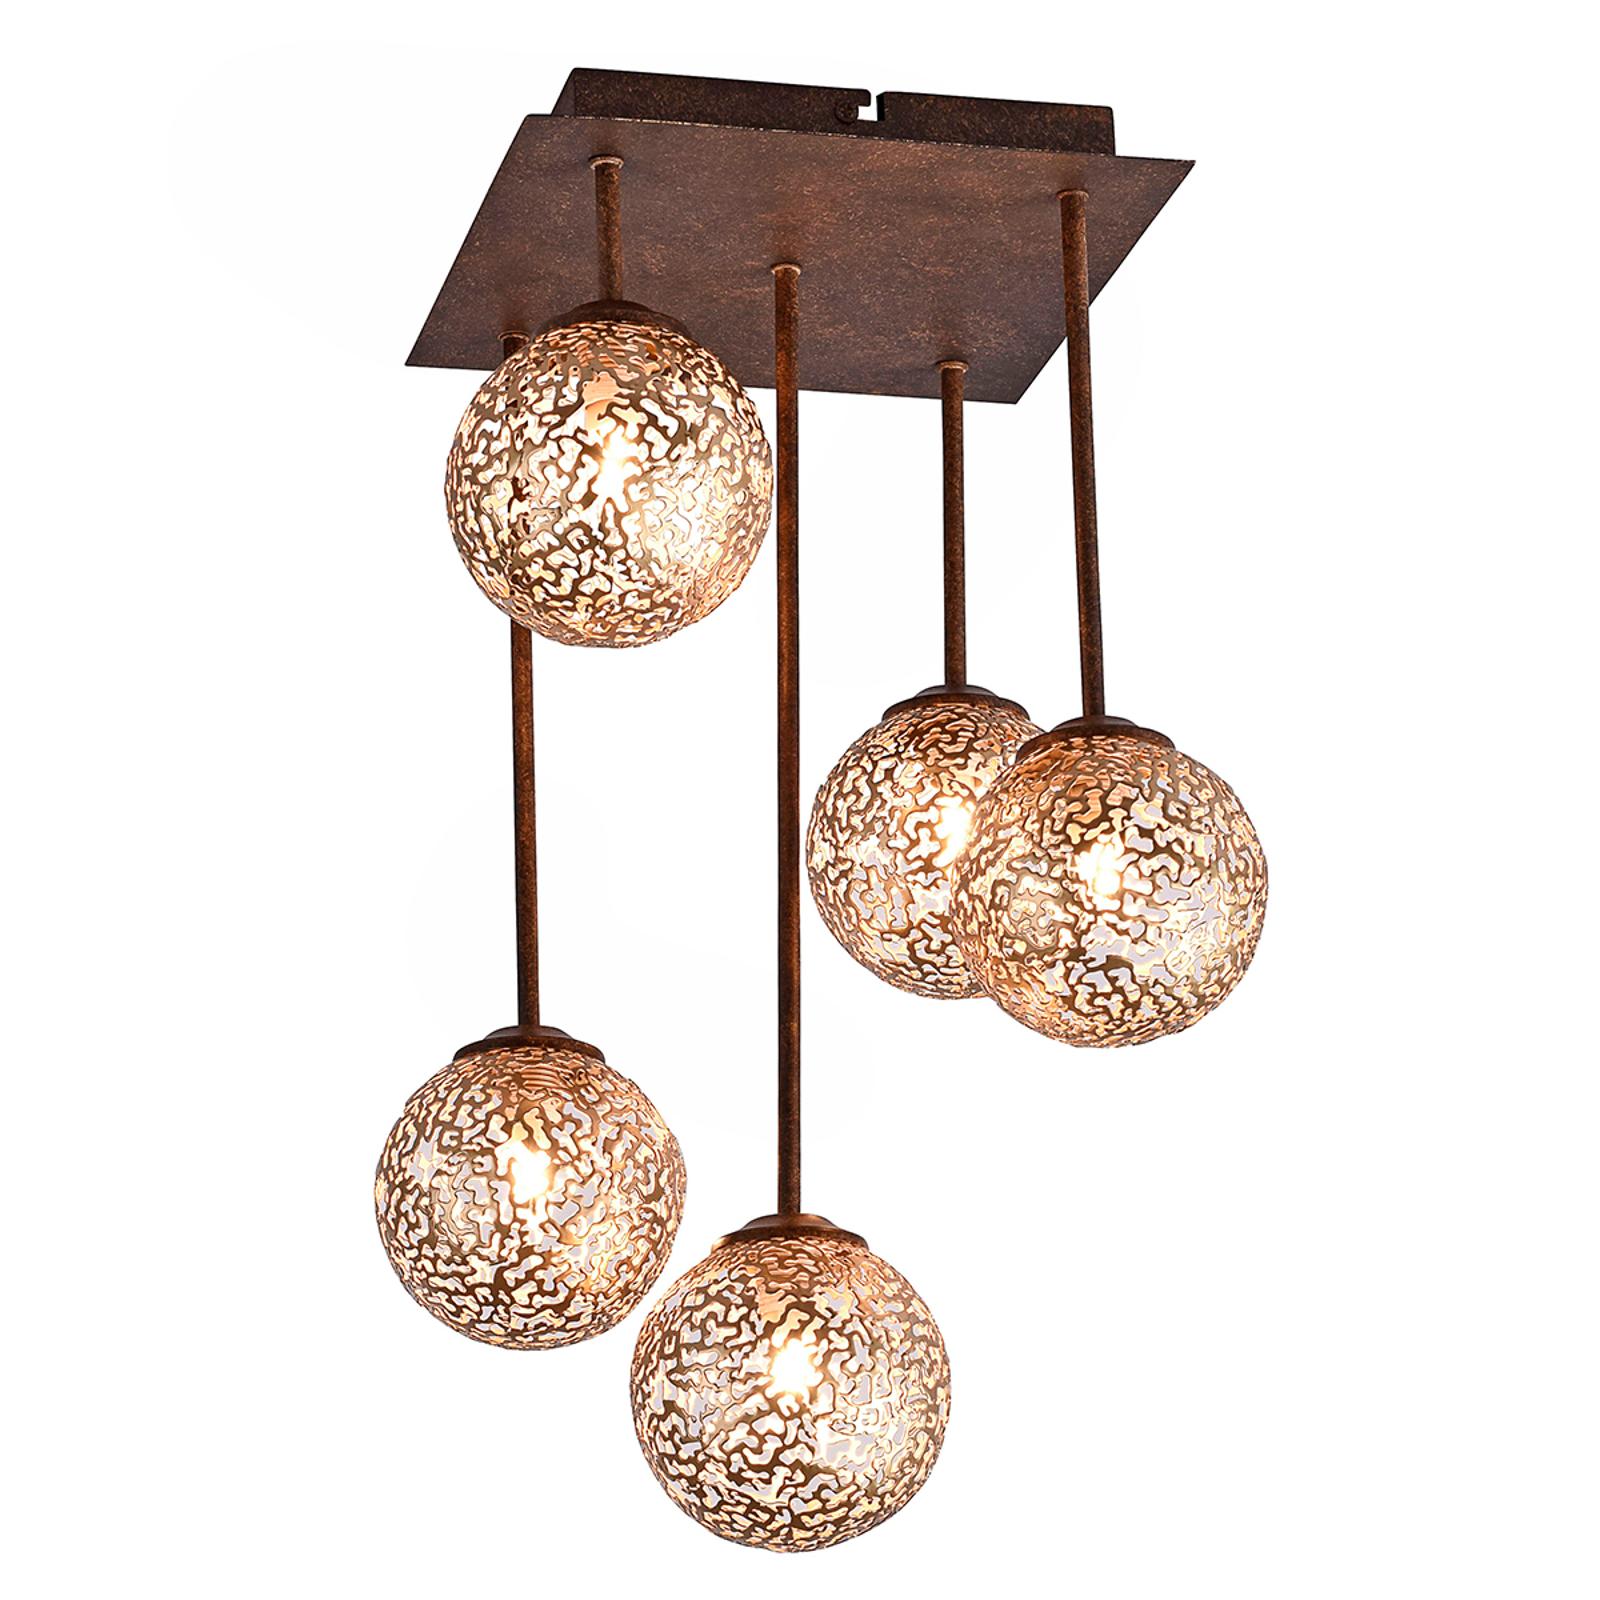 Plafonnier Greta tout en harmonie, 5 lampes